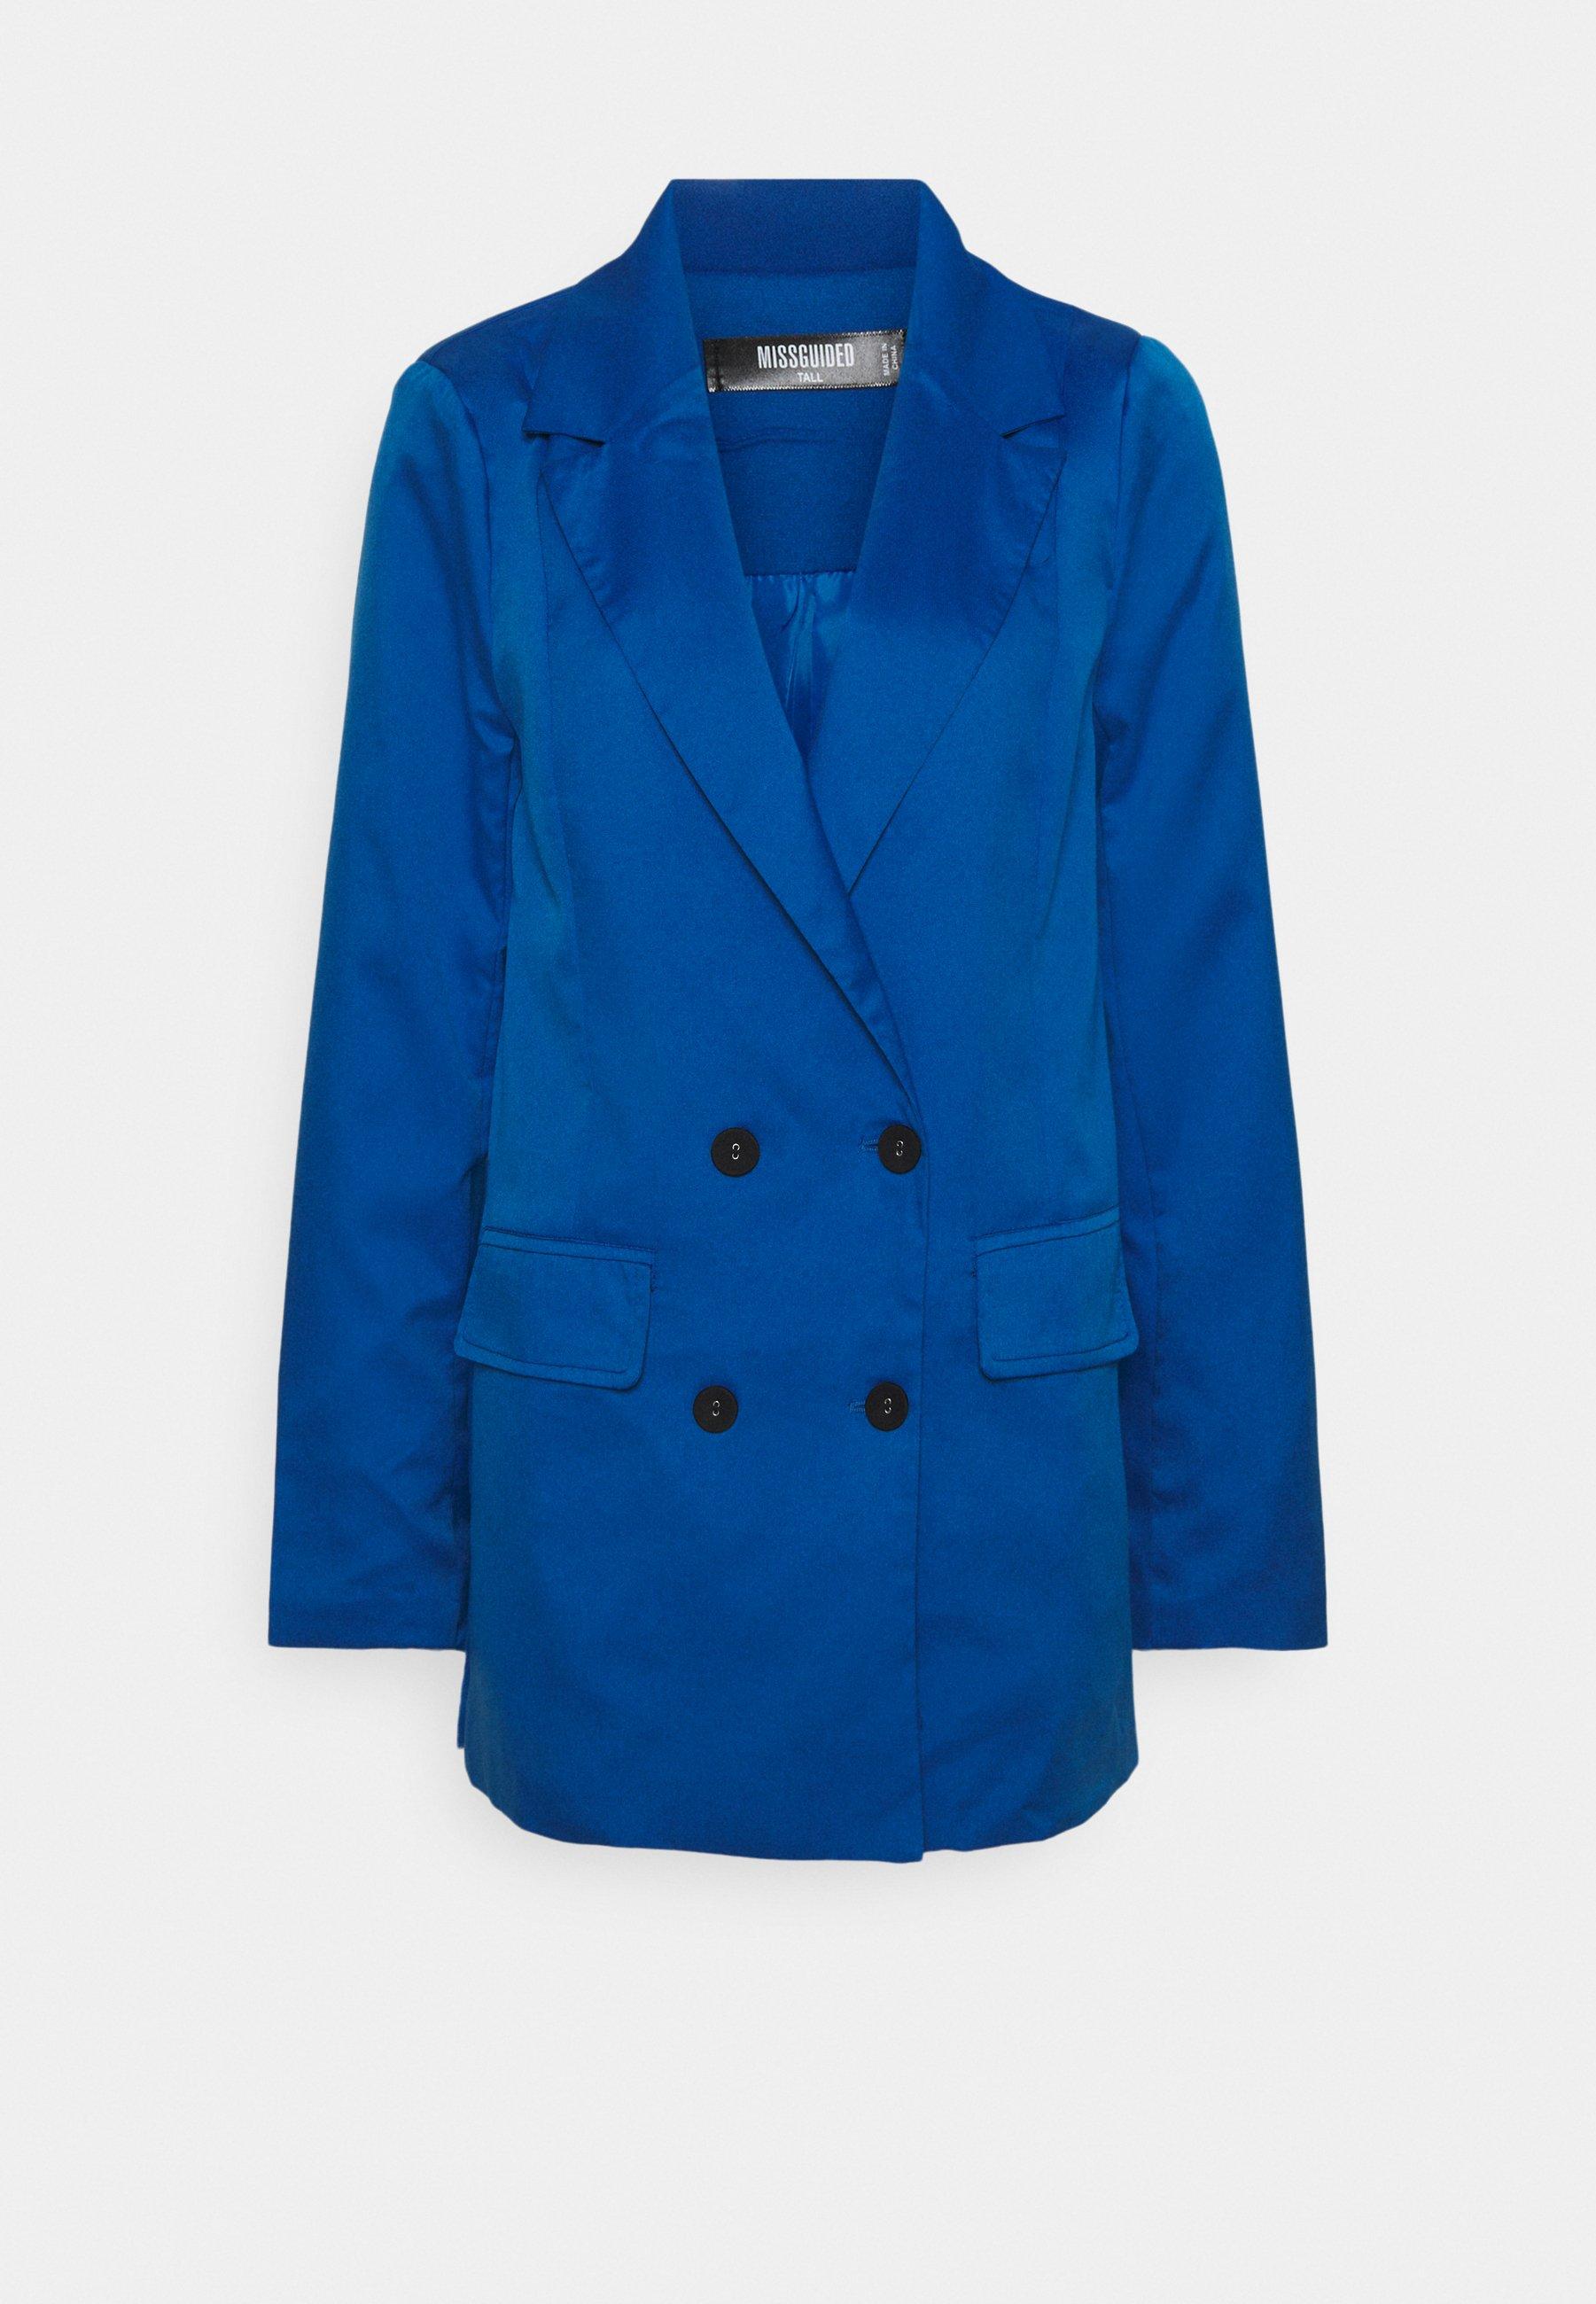 DOUBLE BREASTED JACKET Blazer blue